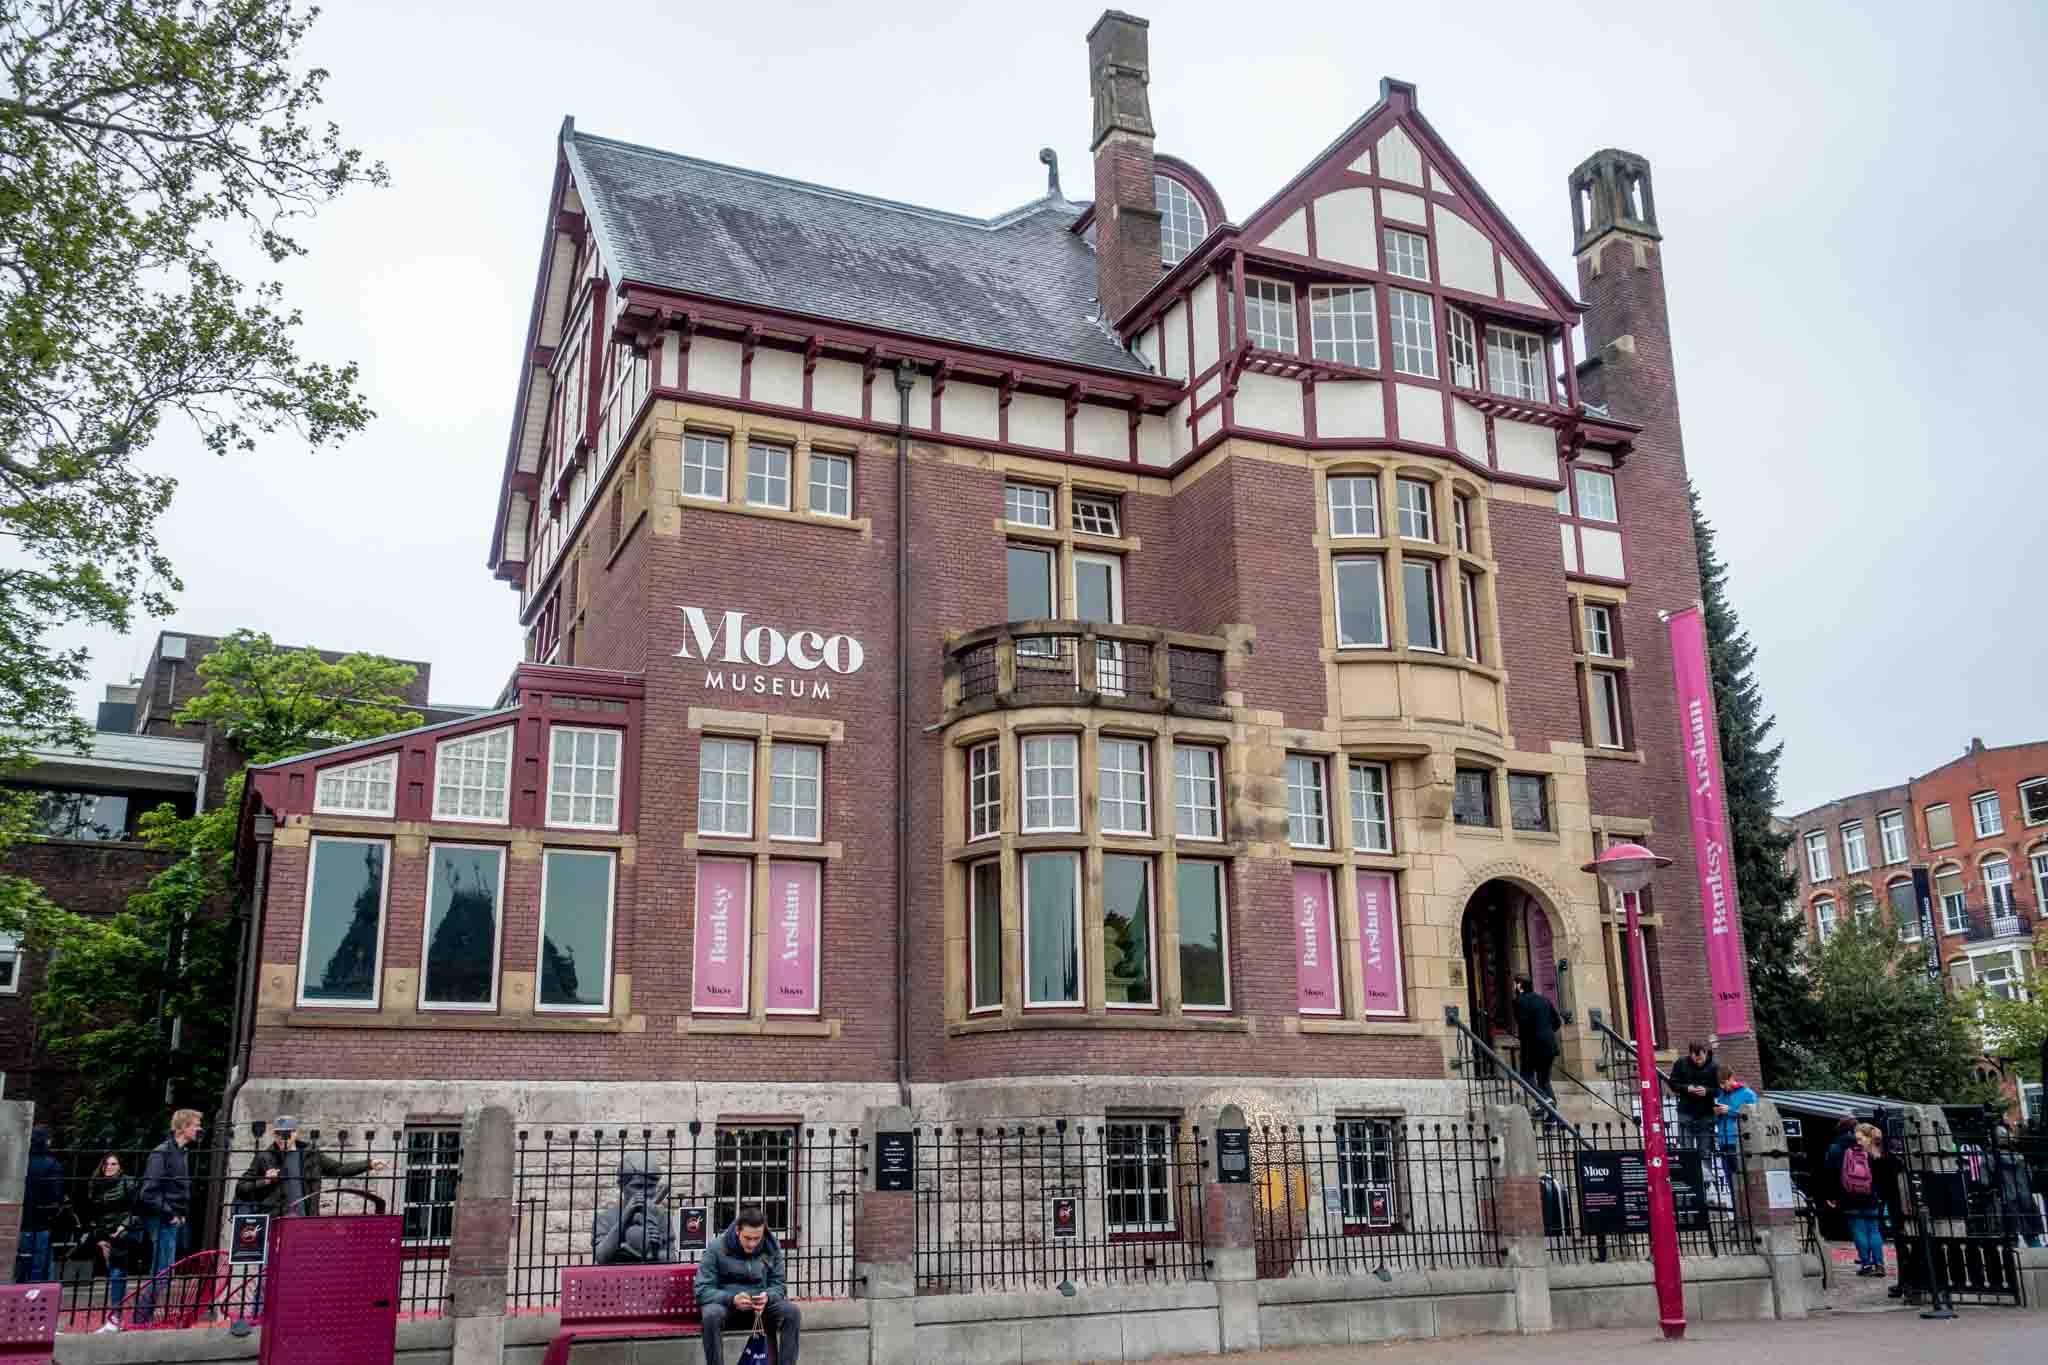 Large brick townhouse with purple trim: MOCO Museum